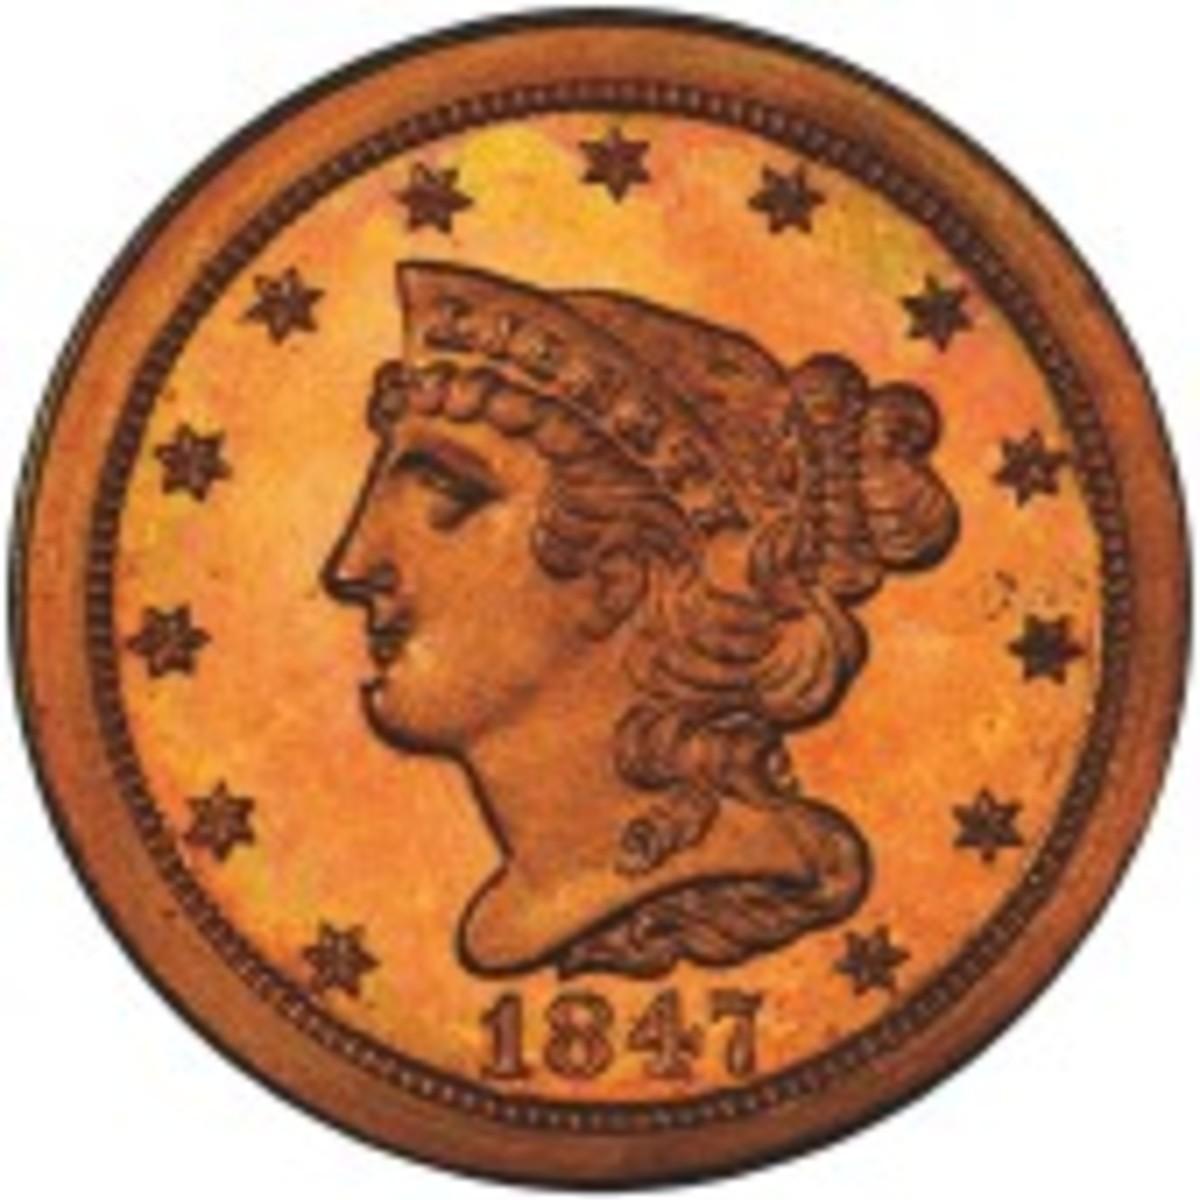 CopperHalf-a.jpg